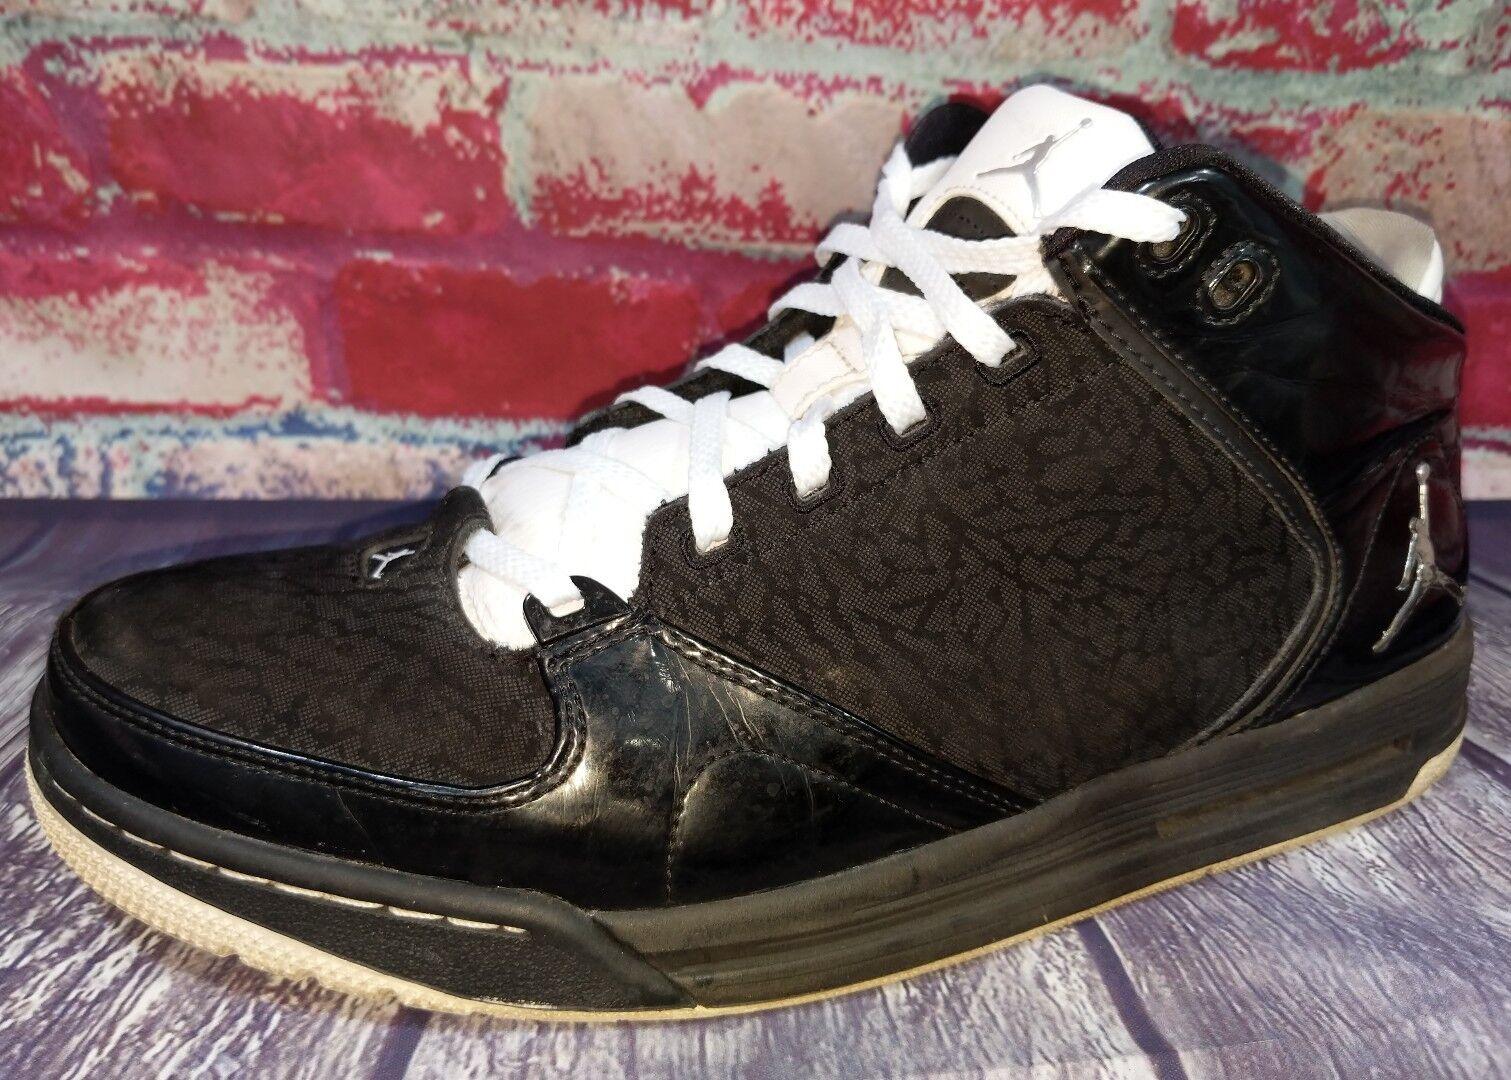 Nike Jordan As You Go 467888 Mens 11 Basketball Shoes Black Patent Leather White Seasonal price cuts, discount benefits